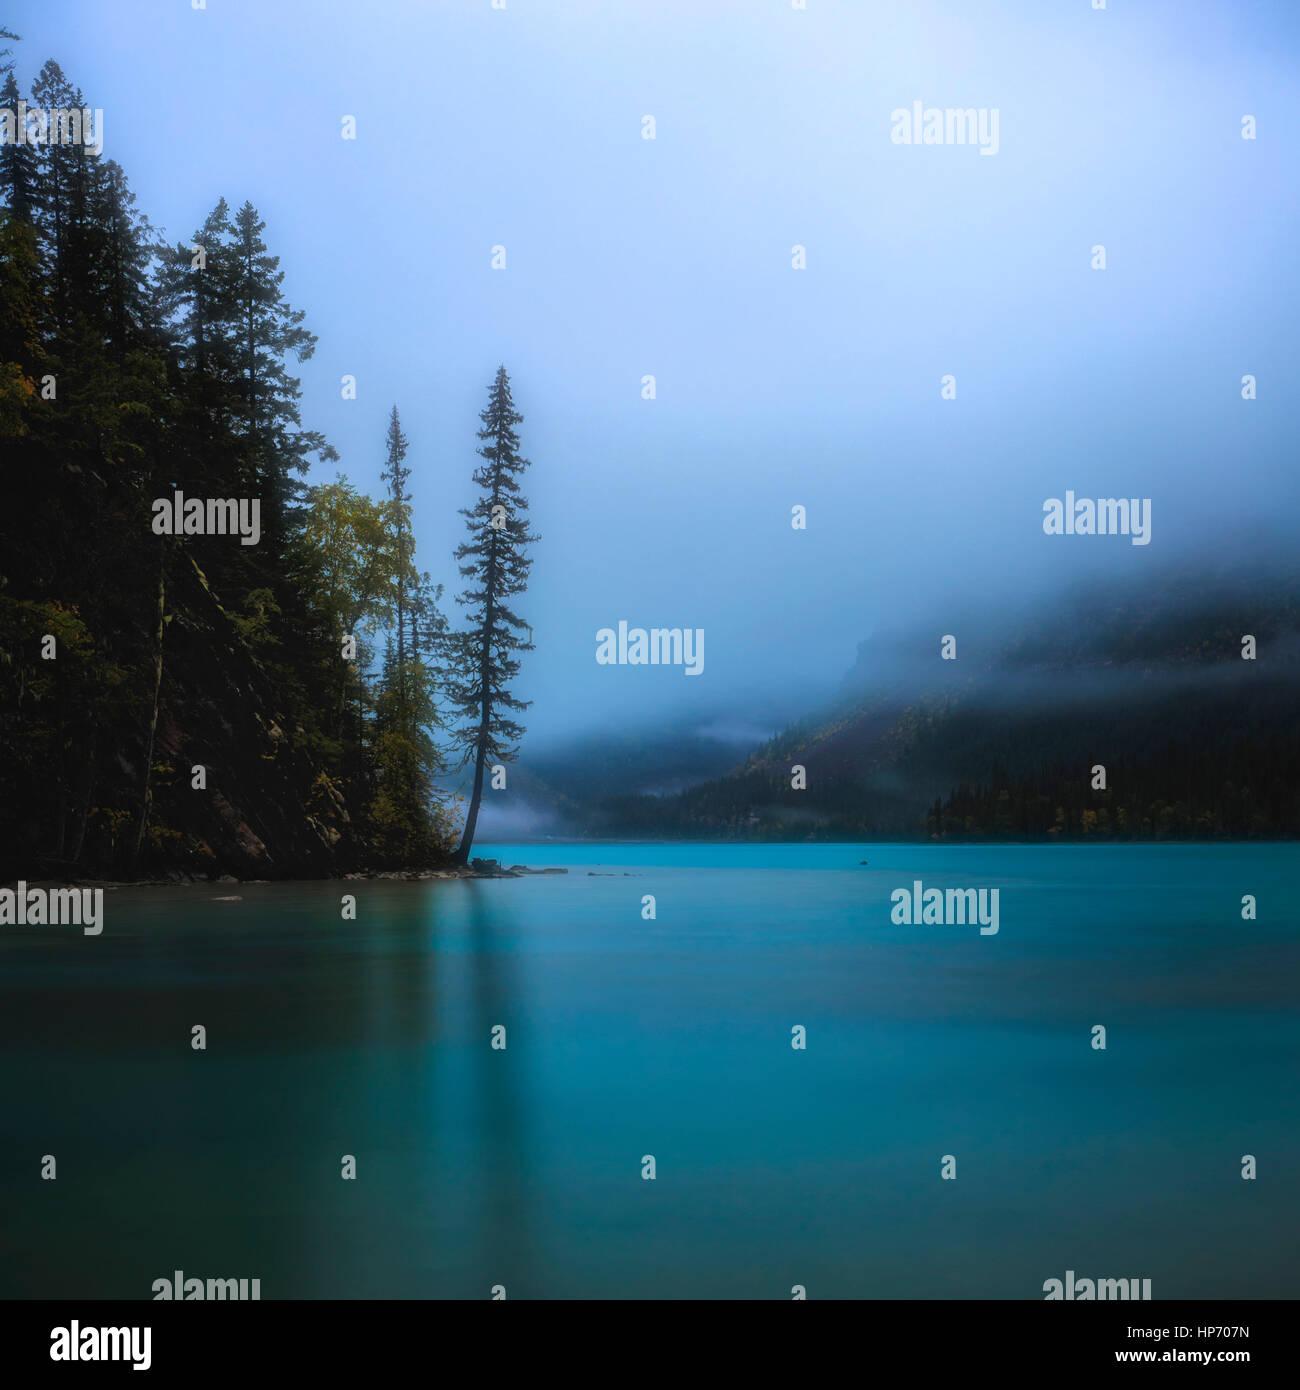 Einsamer Baum am Ufer des Kinney Lake, Mt Robson National Park, Britisch-Kolumbien, Kanada Stockbild